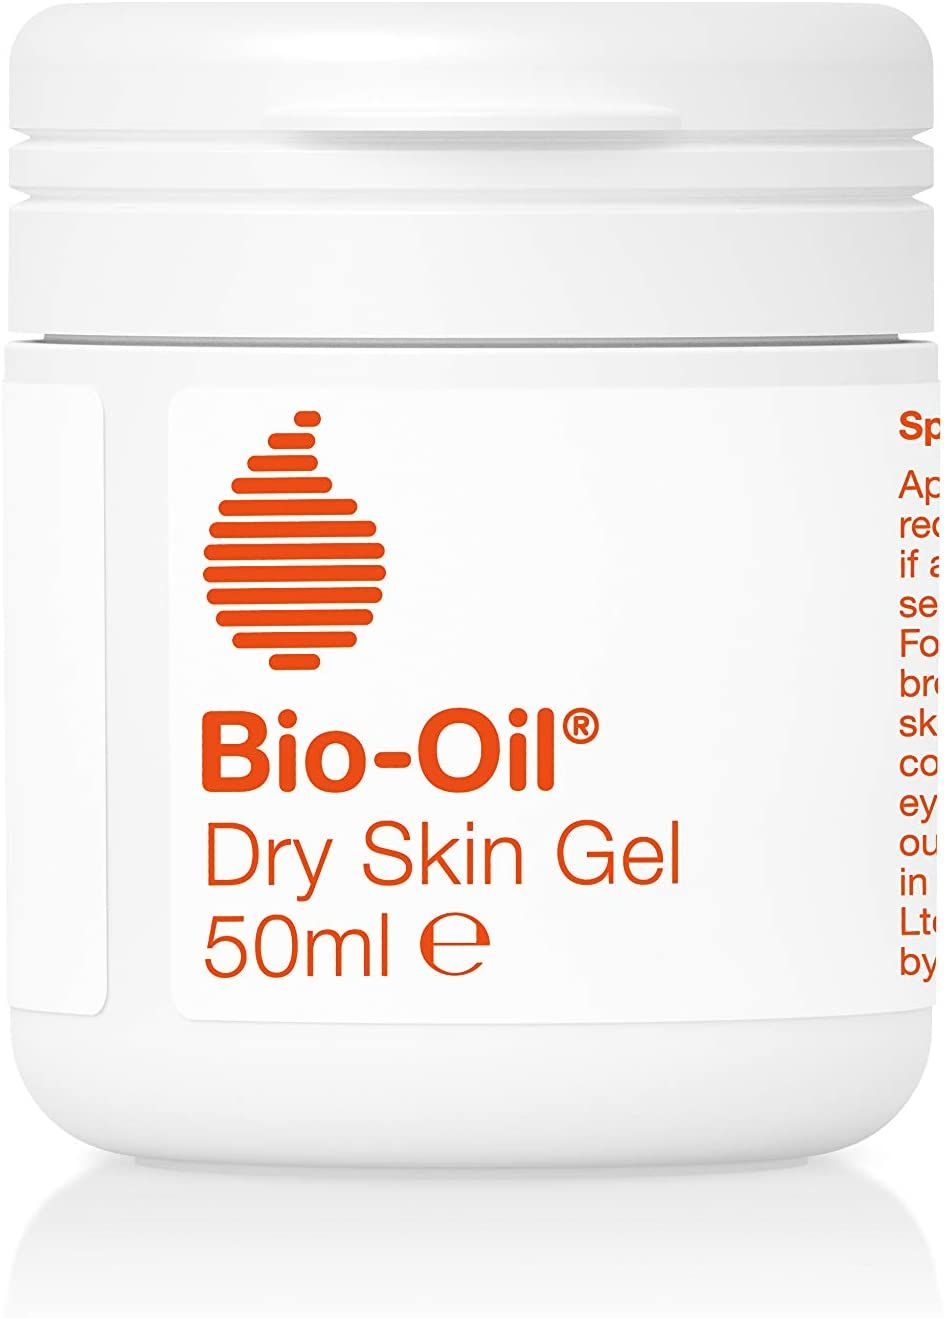 Bio Oil 干性皮肤凝胶 亚马逊中国 个护健康 Skin Gel Bio Oil Gel